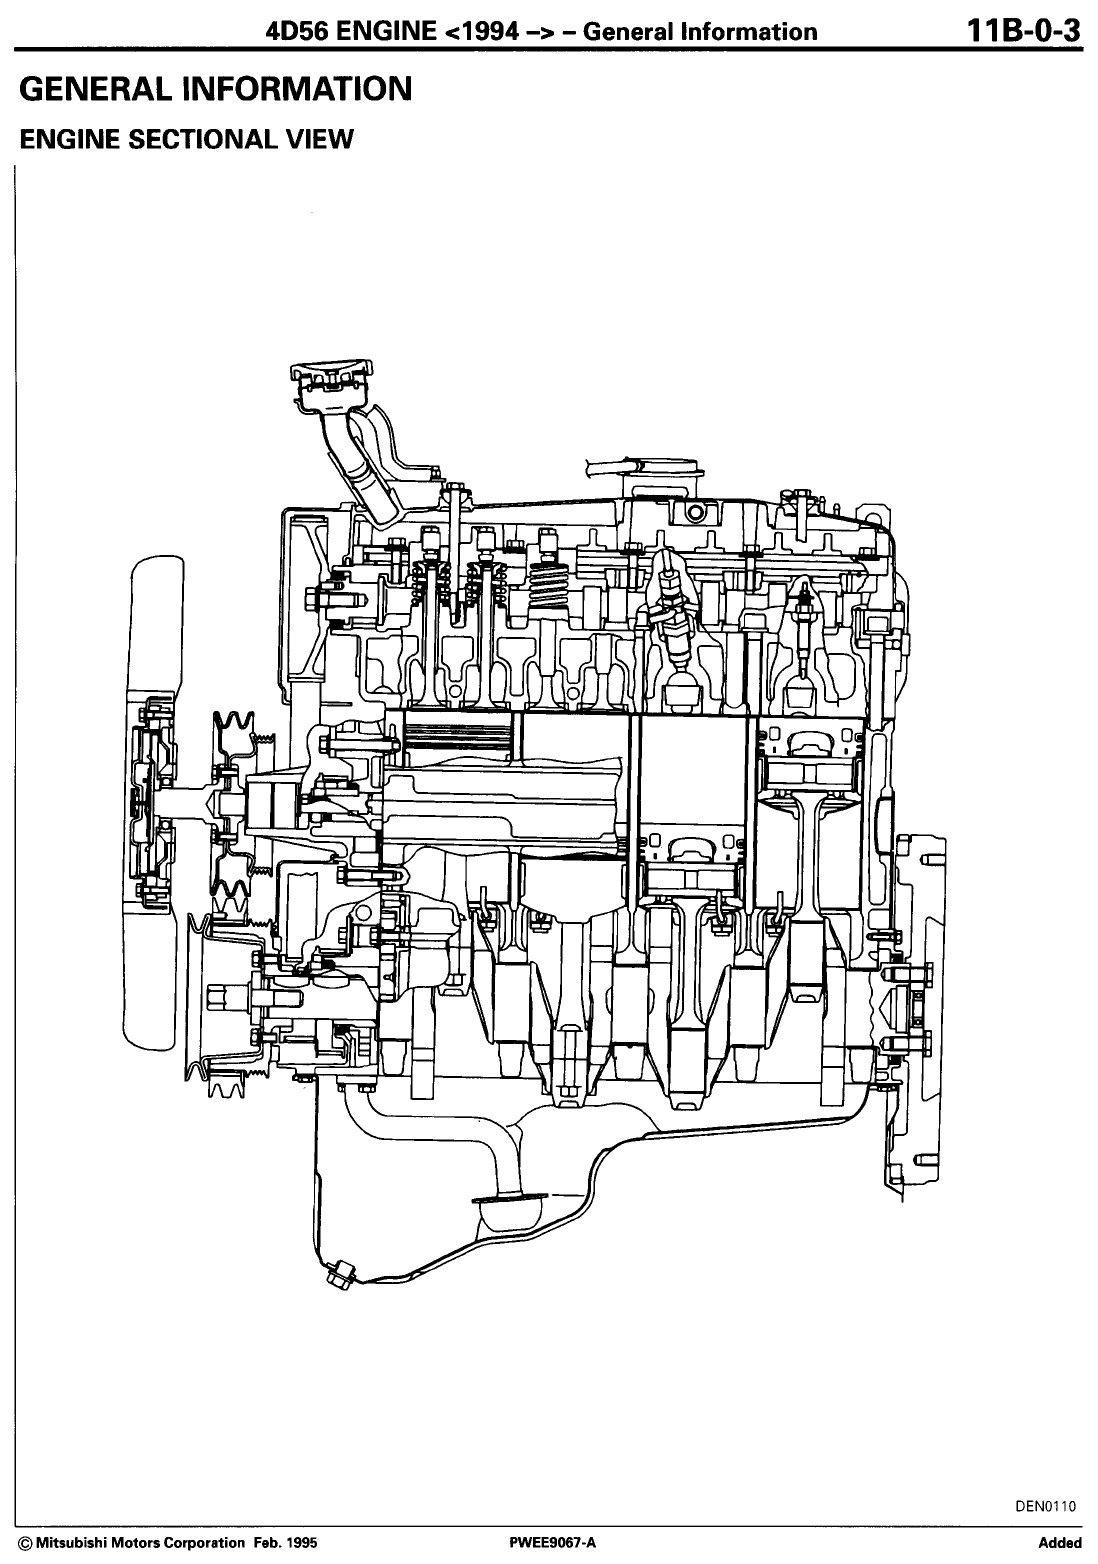 Pin de Dx Lee en Mitsubishi pajero 4d56 diesel turbo engine